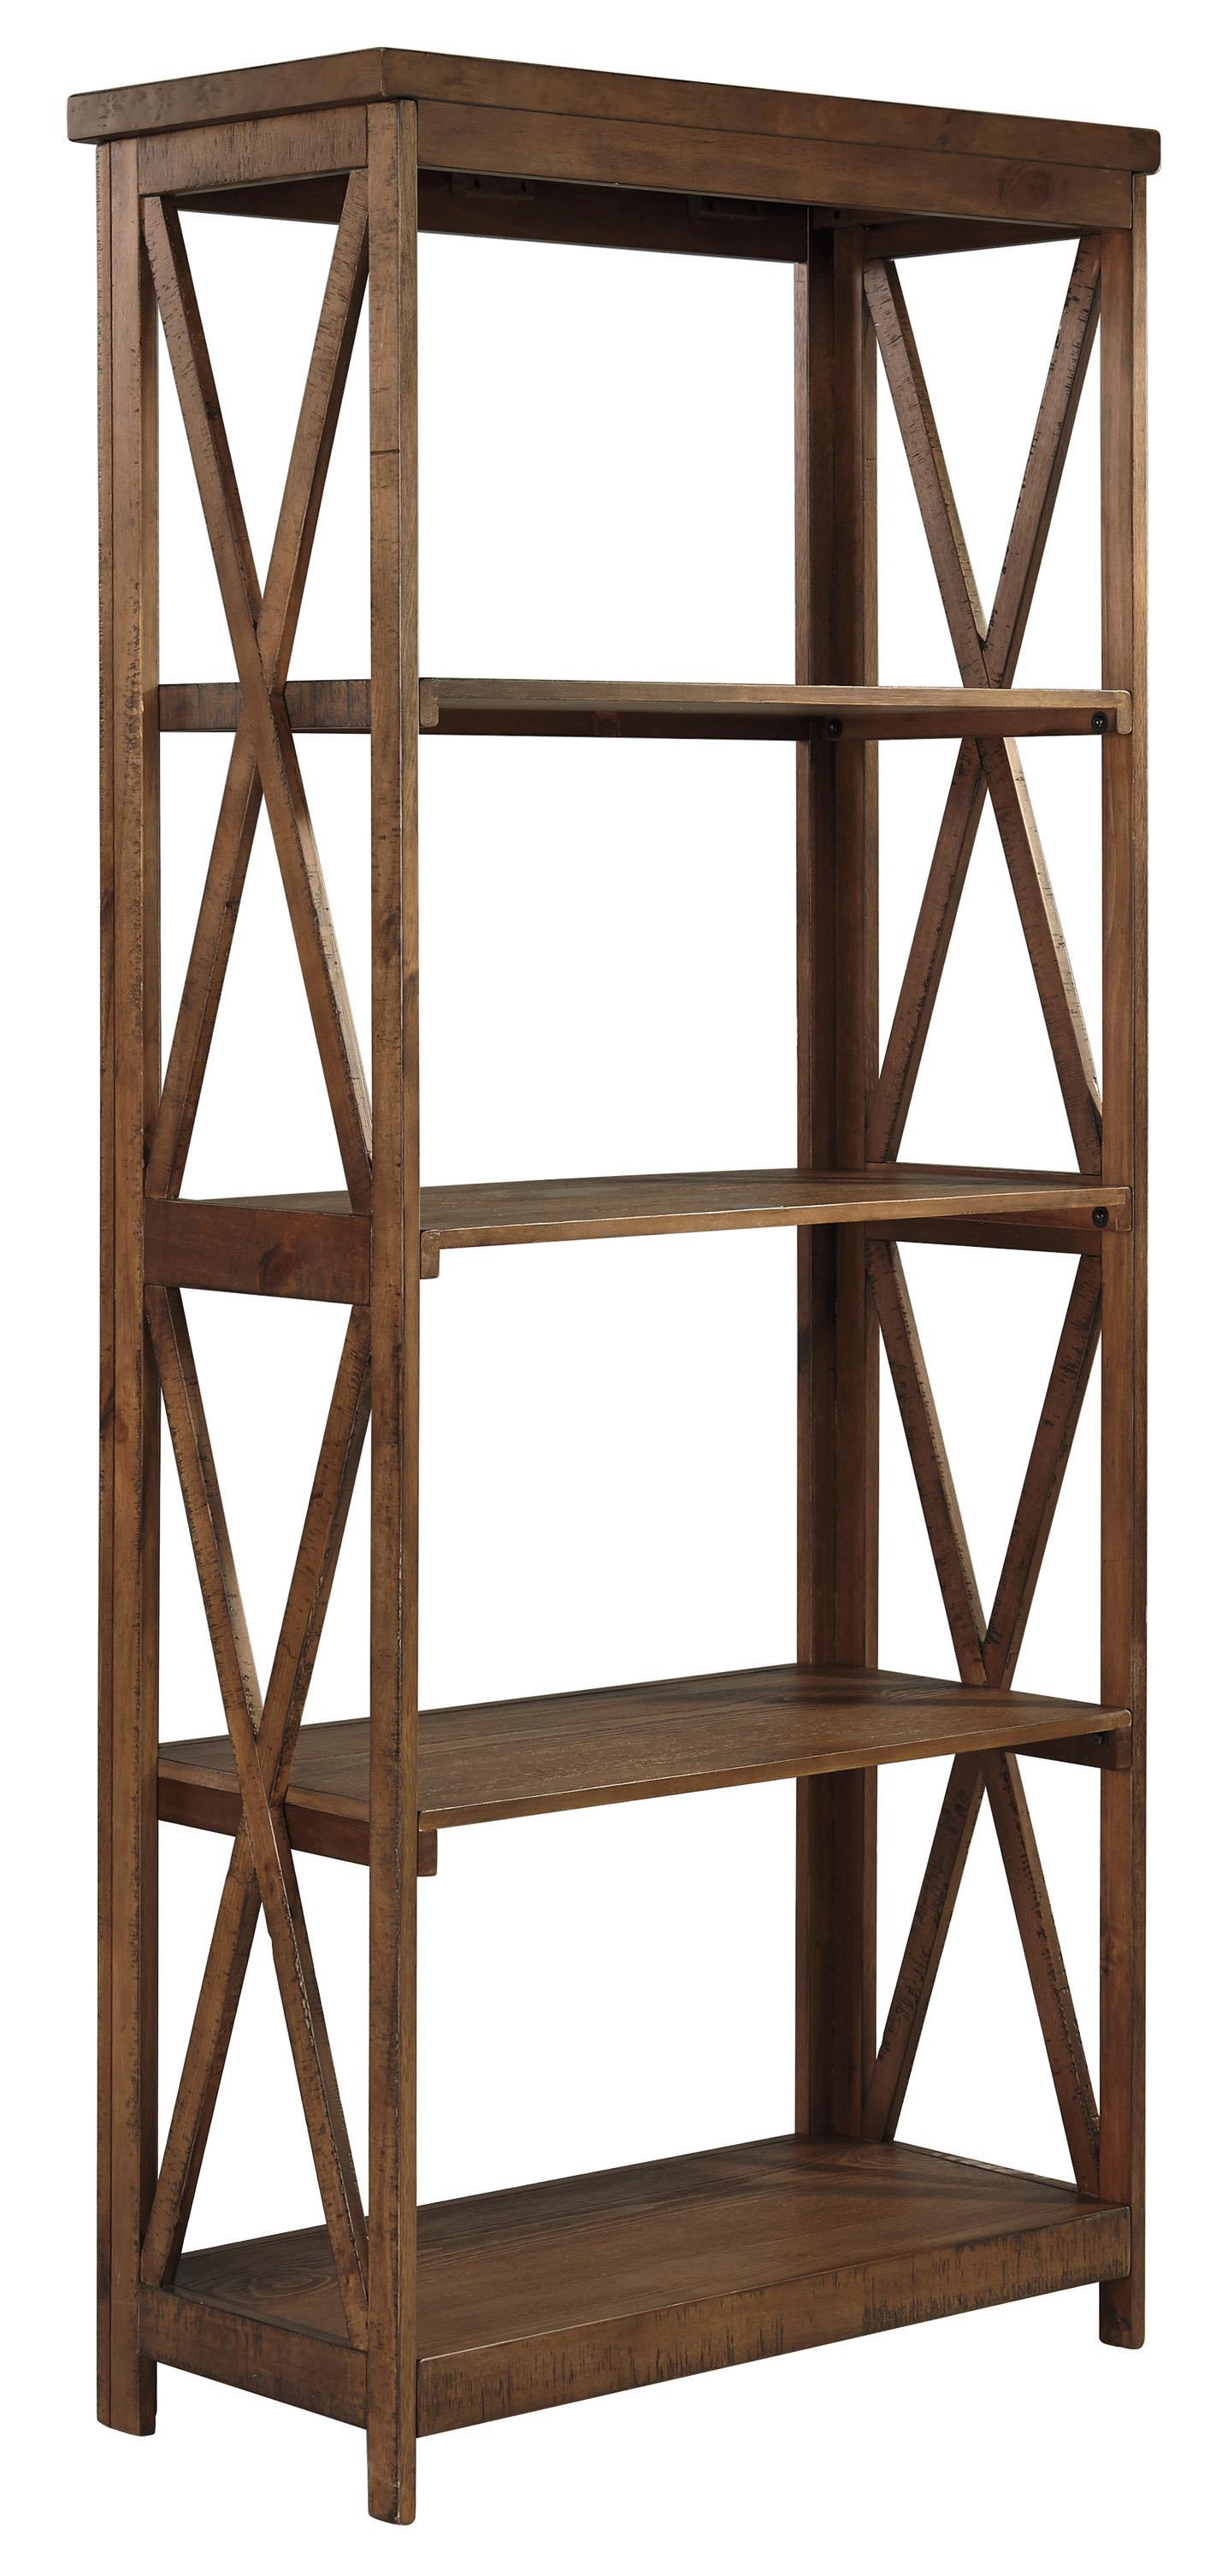 Signature Design by Ashley Minbreeze Large Bookcase - Item Number: H588-17